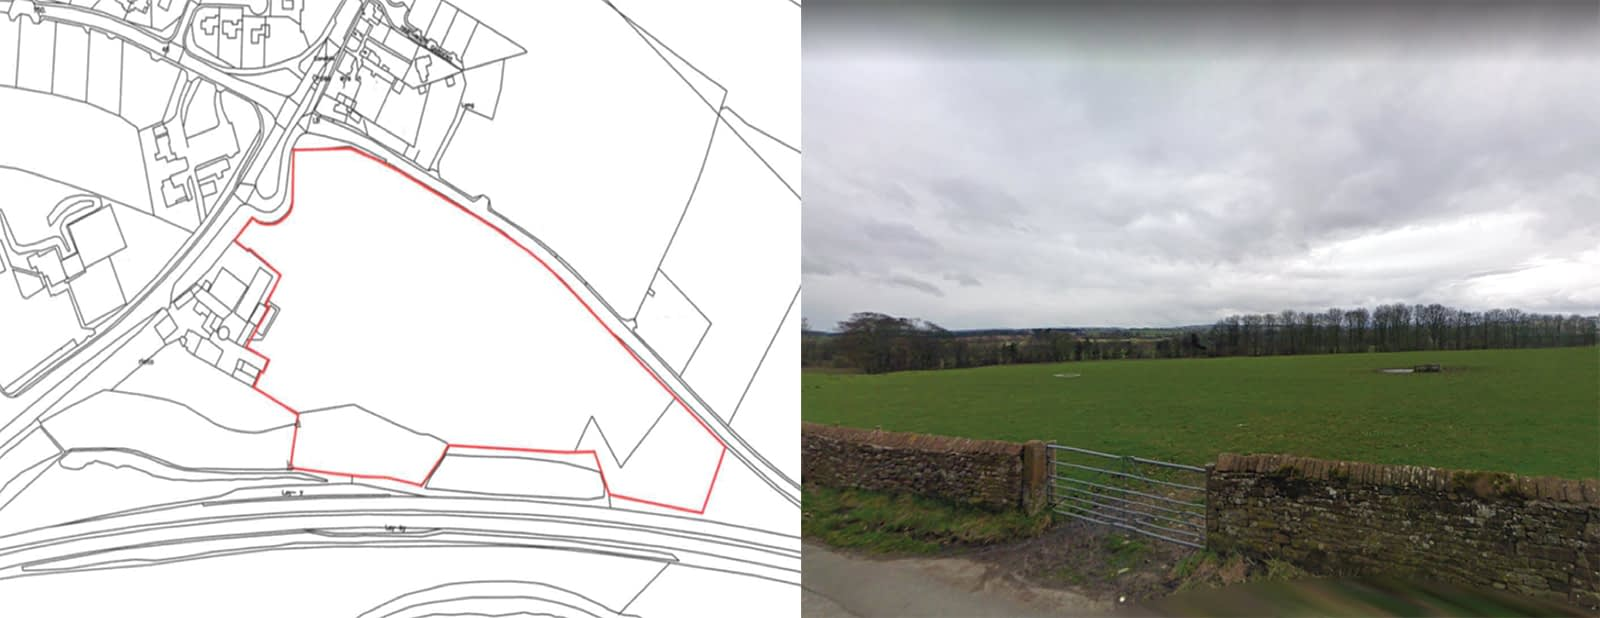 Land For Sale Carleton Avenue Penrith Cumbria